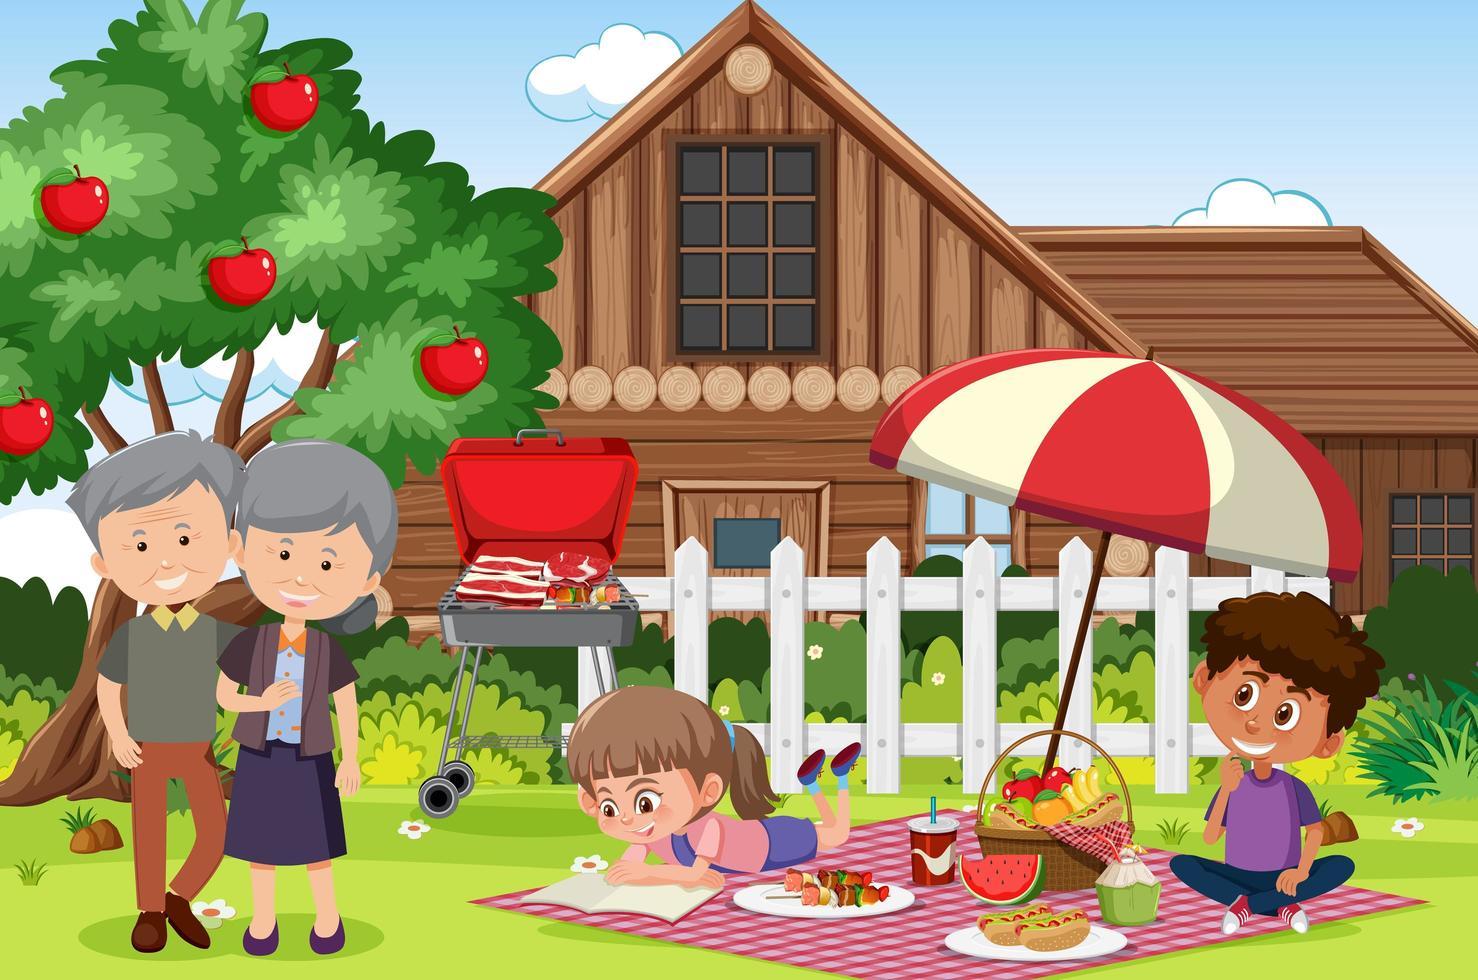 Picnic scene with happy family in yard vector